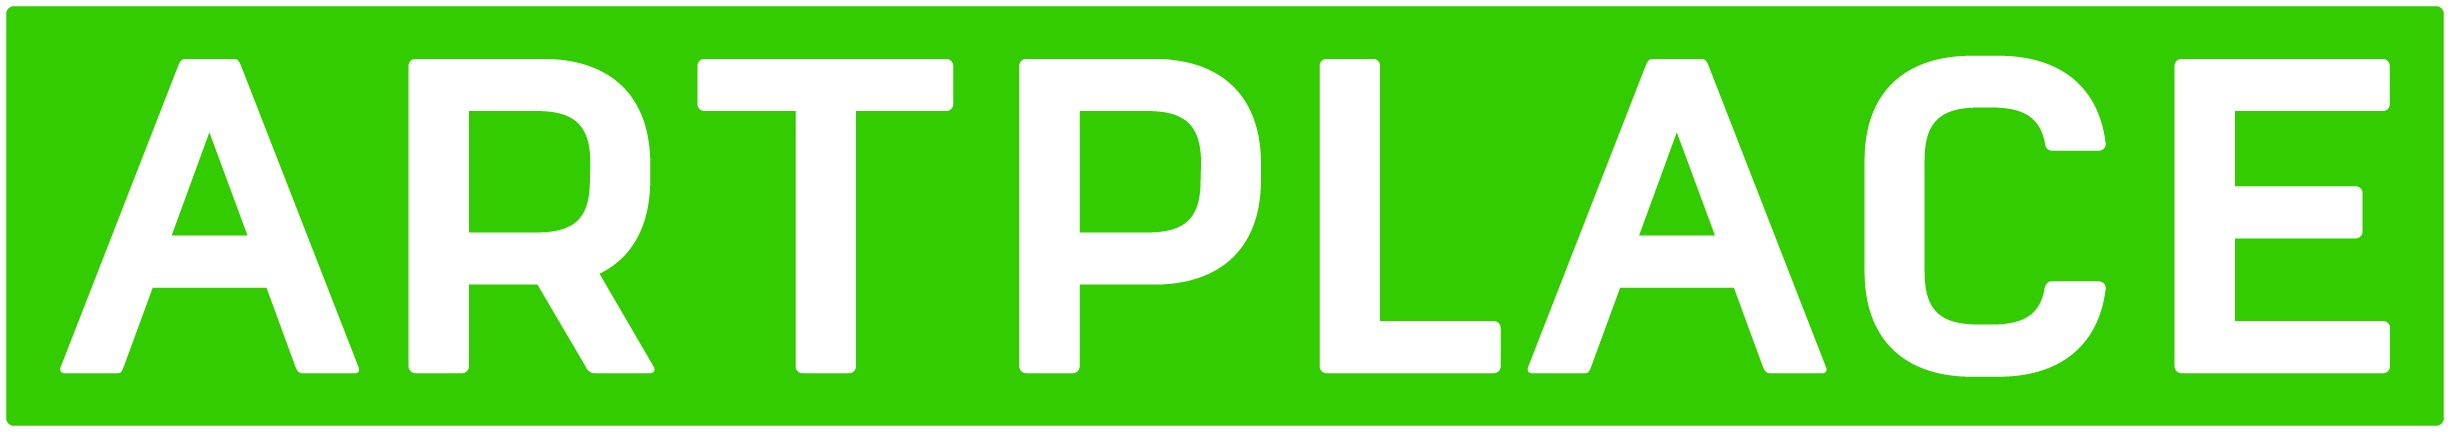 logo_0.jpg